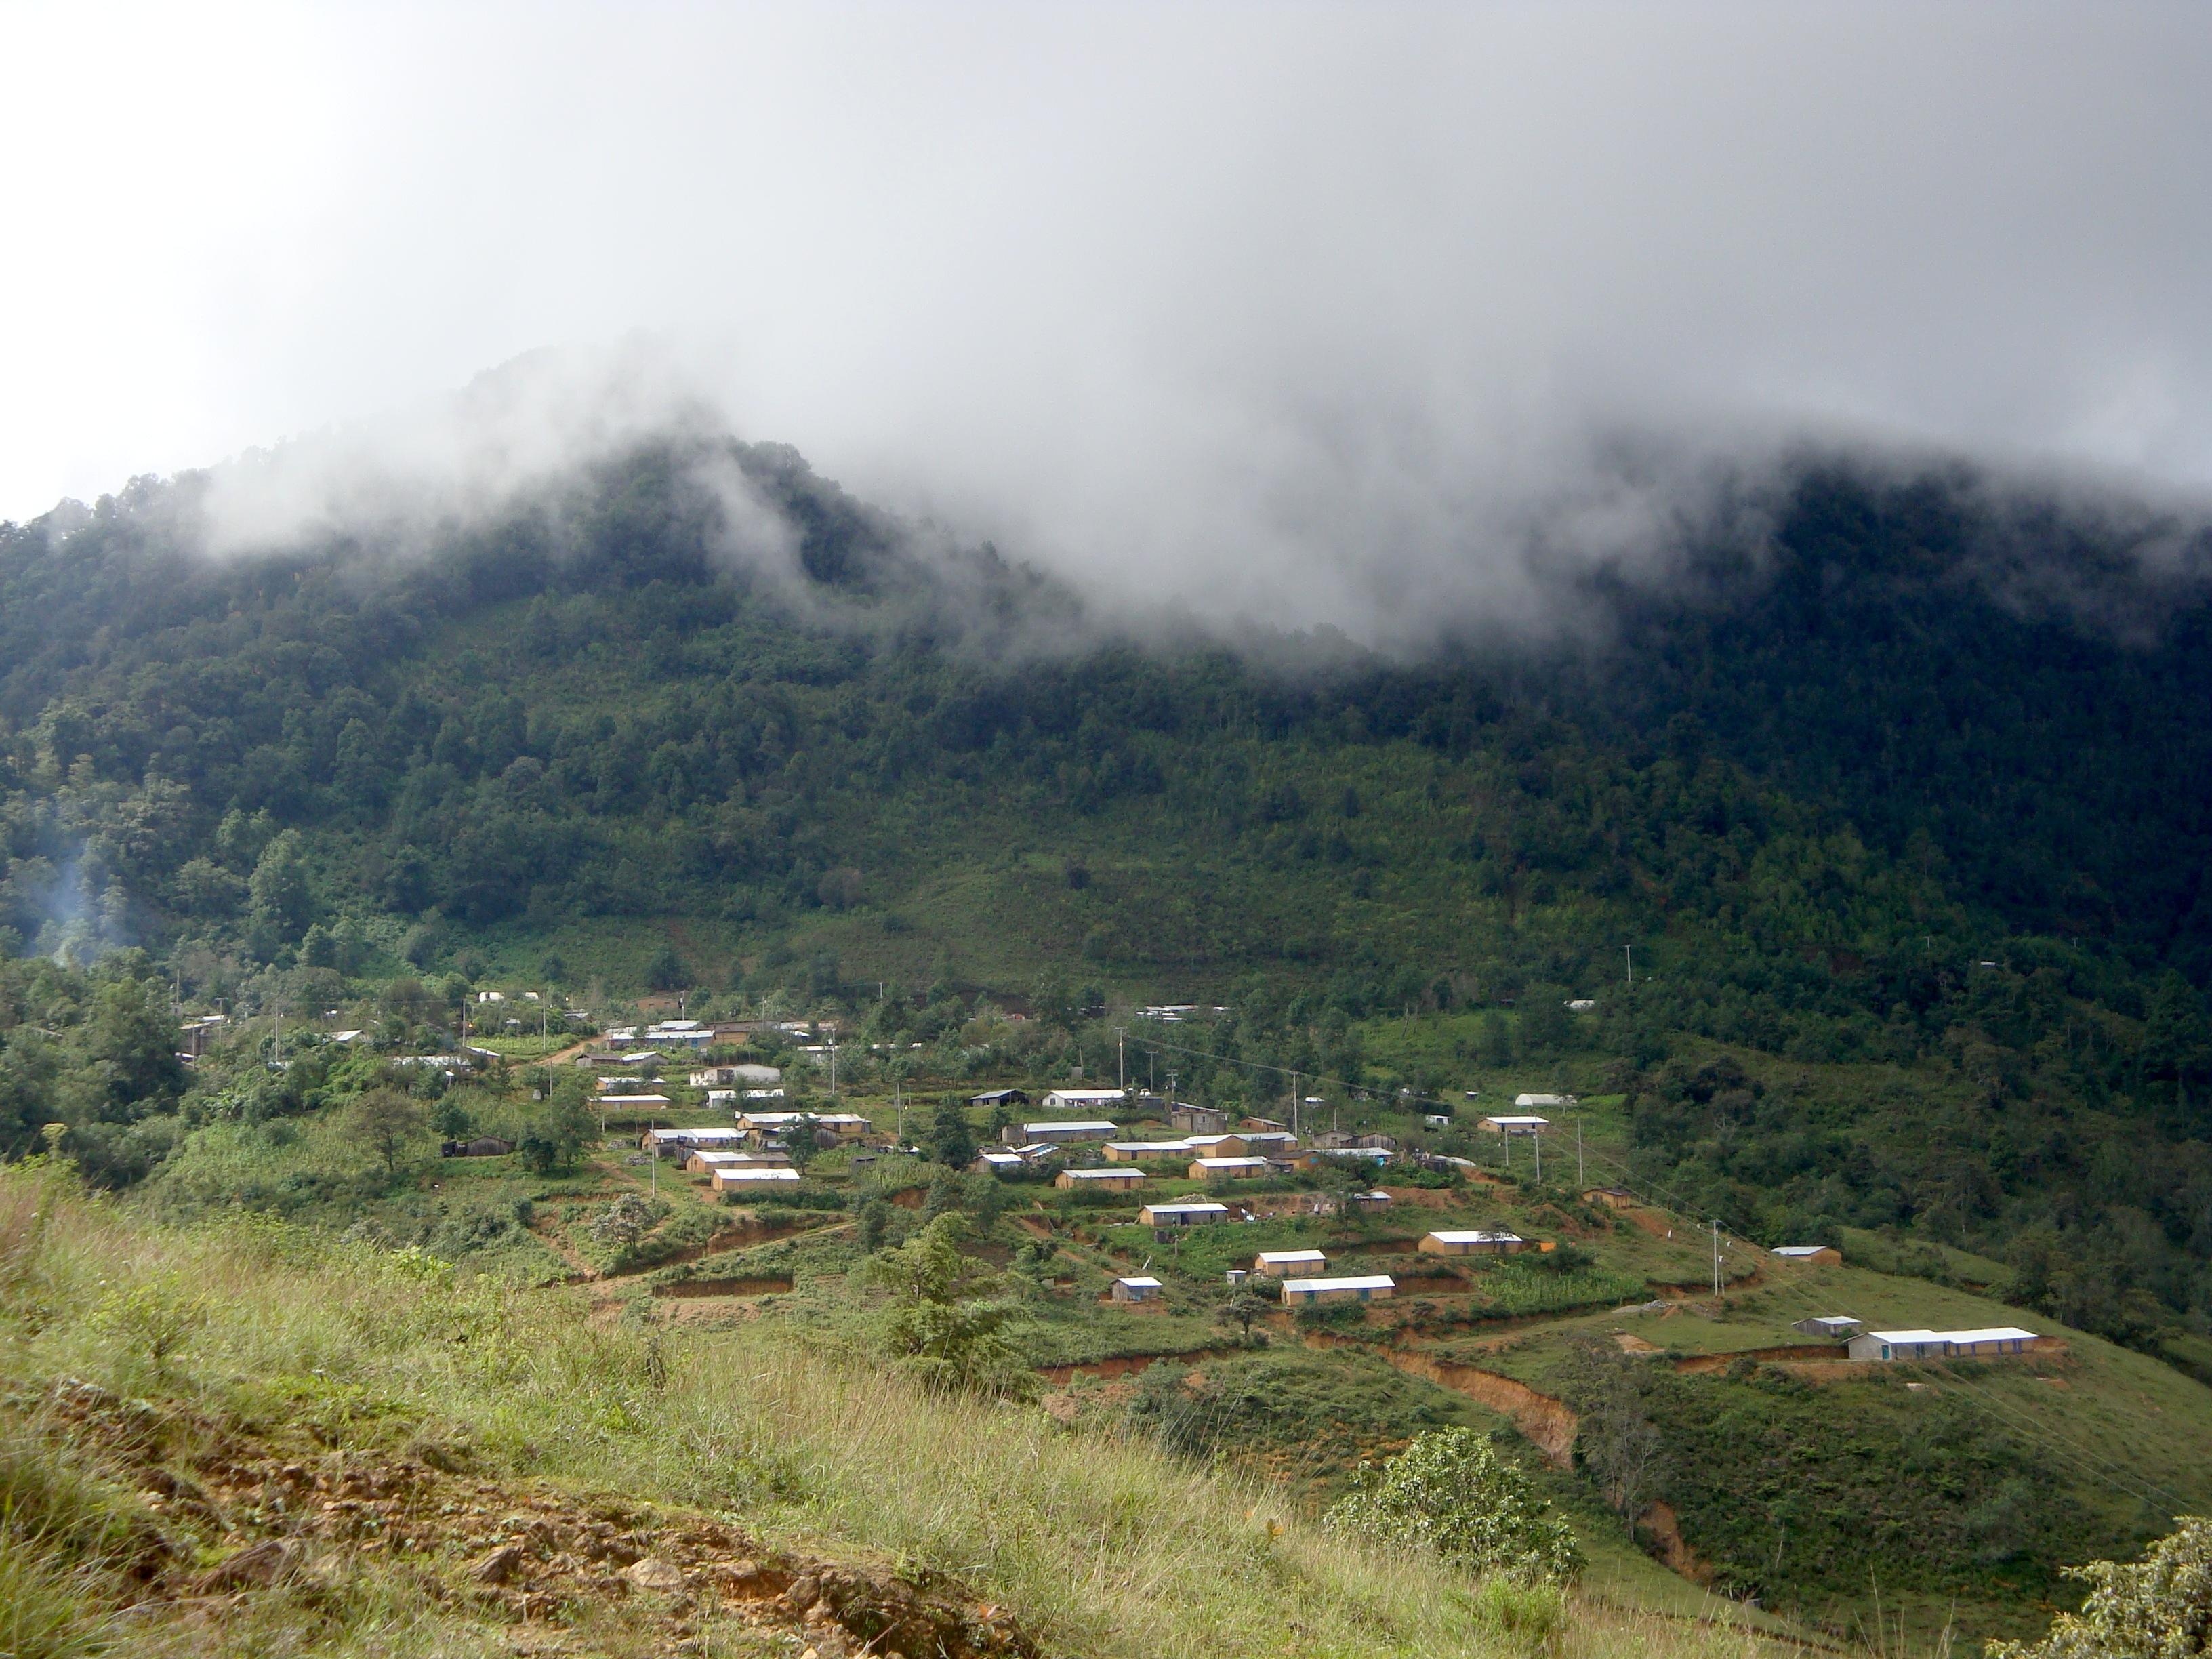 Asignan 125 efectivos para buscar a familia en La Montaña de Guerrero